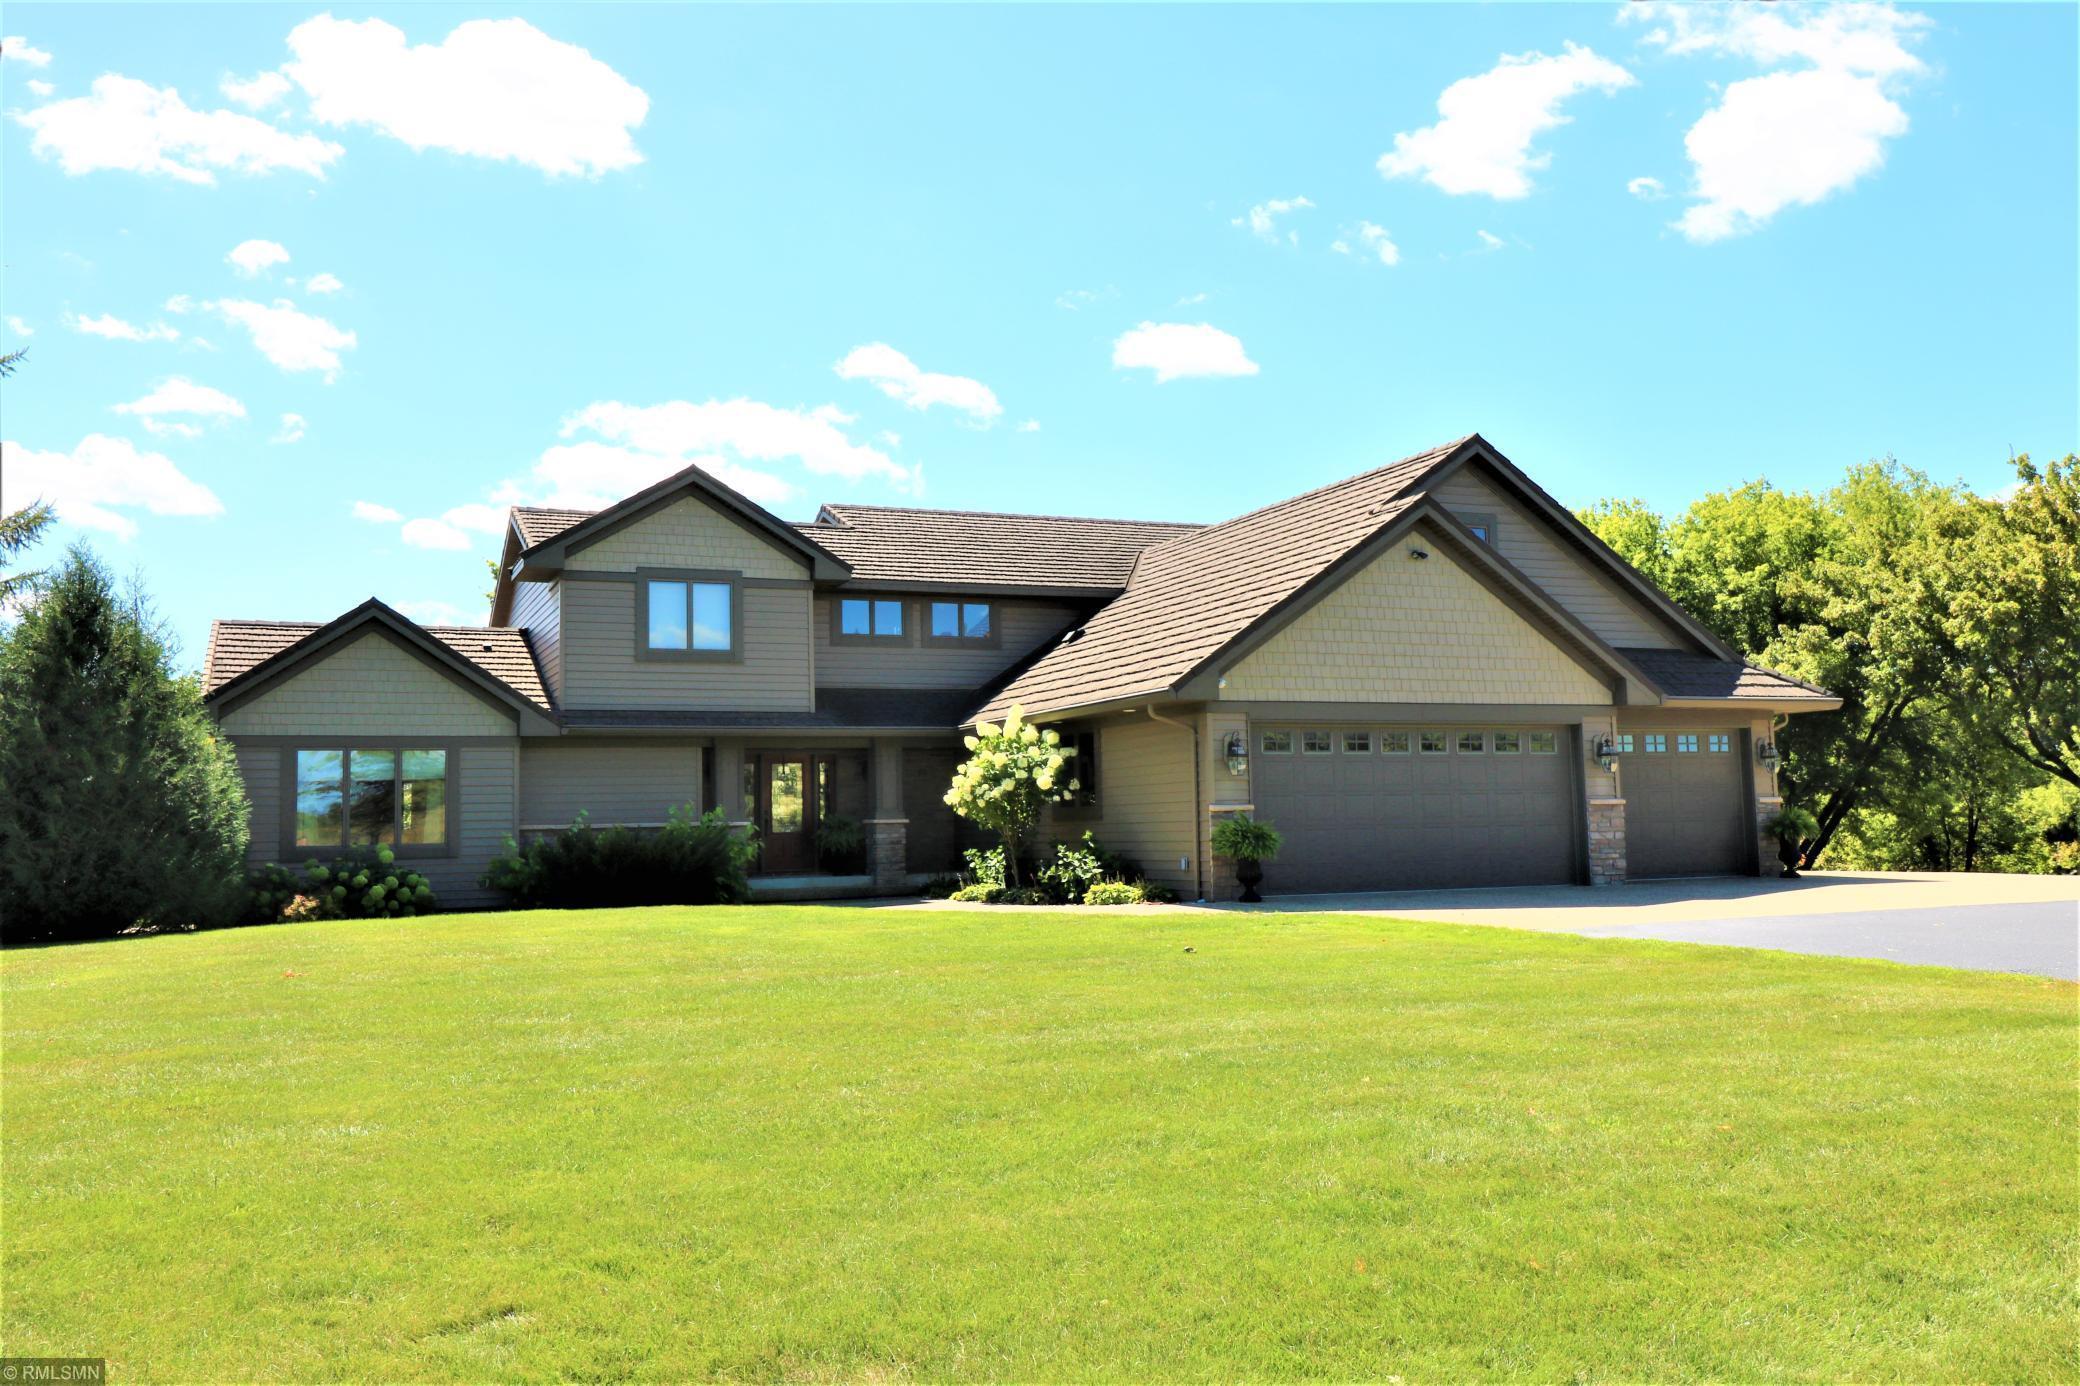 58285 206th Street Property Photo - Mankato, MN real estate listing